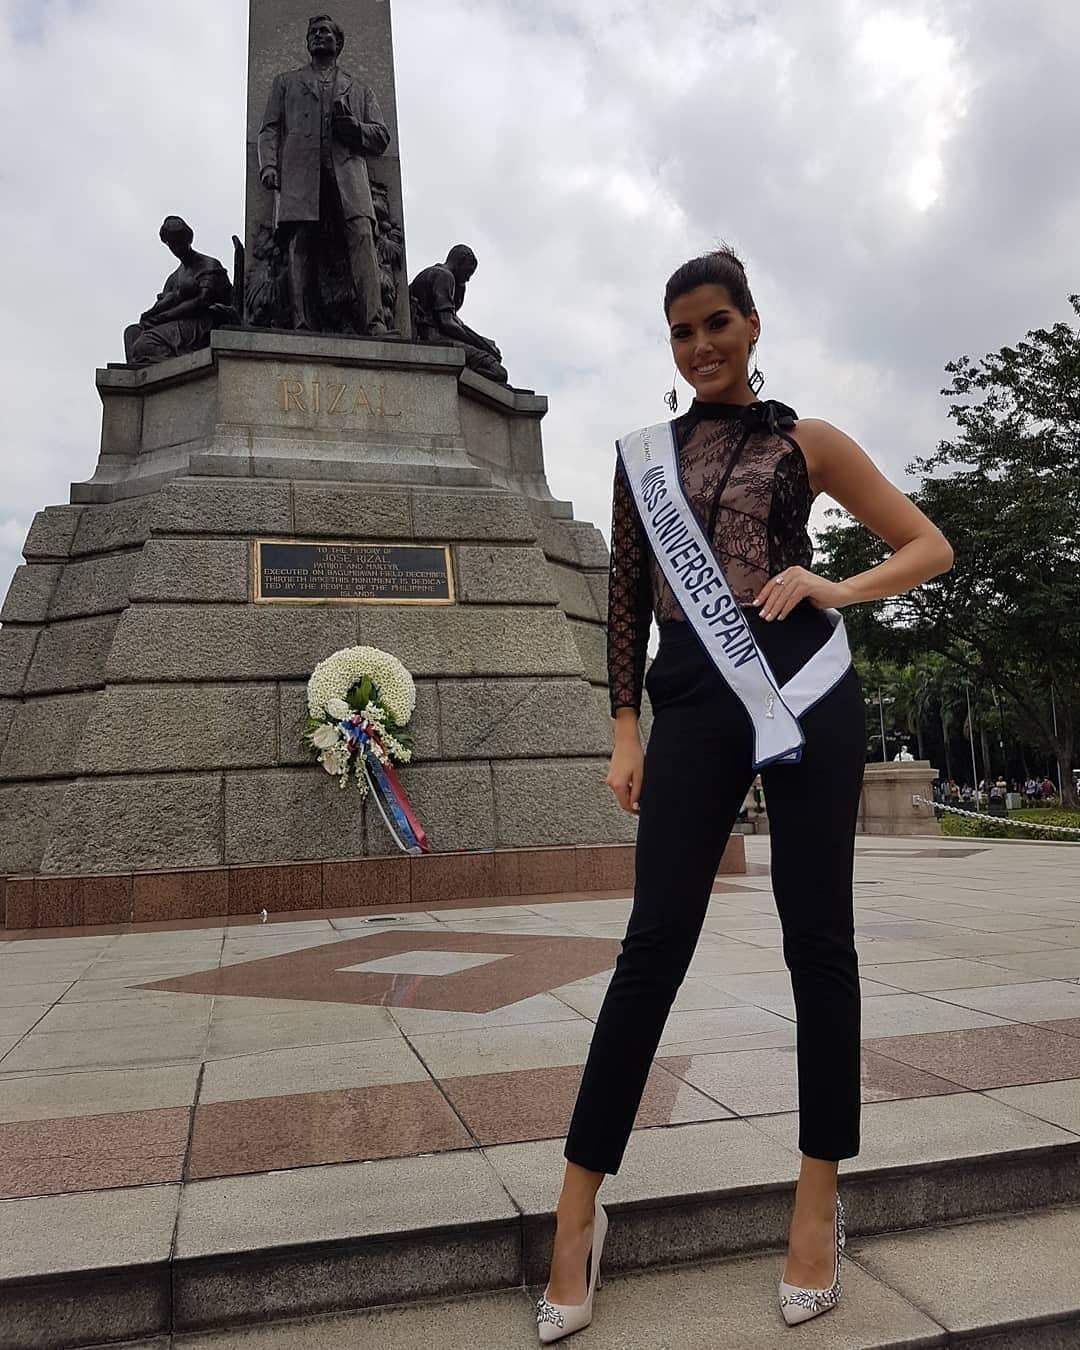 sofia del prado, reyna hispanoamericana 2015, top 10 de miss universe 2017. - Página 14 24838711